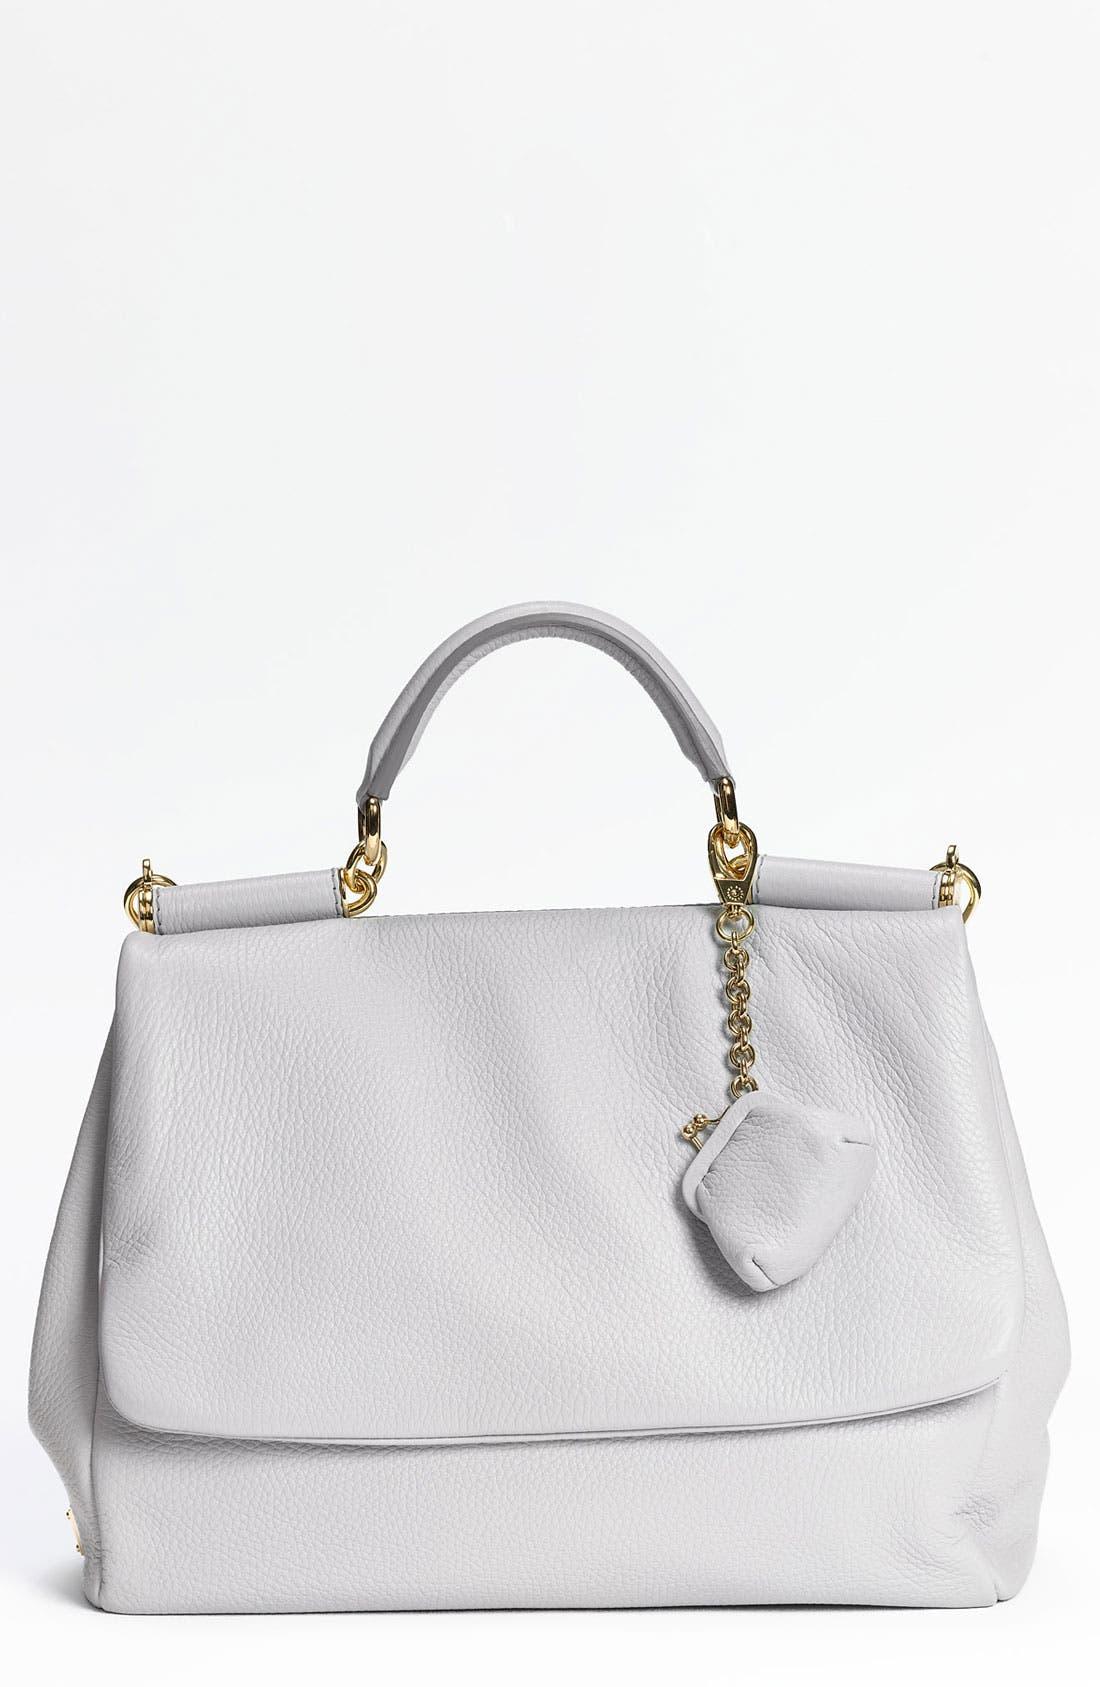 Main Image - Dolce&Gabbana 'Miss Sicily Soft' Leather Satchel